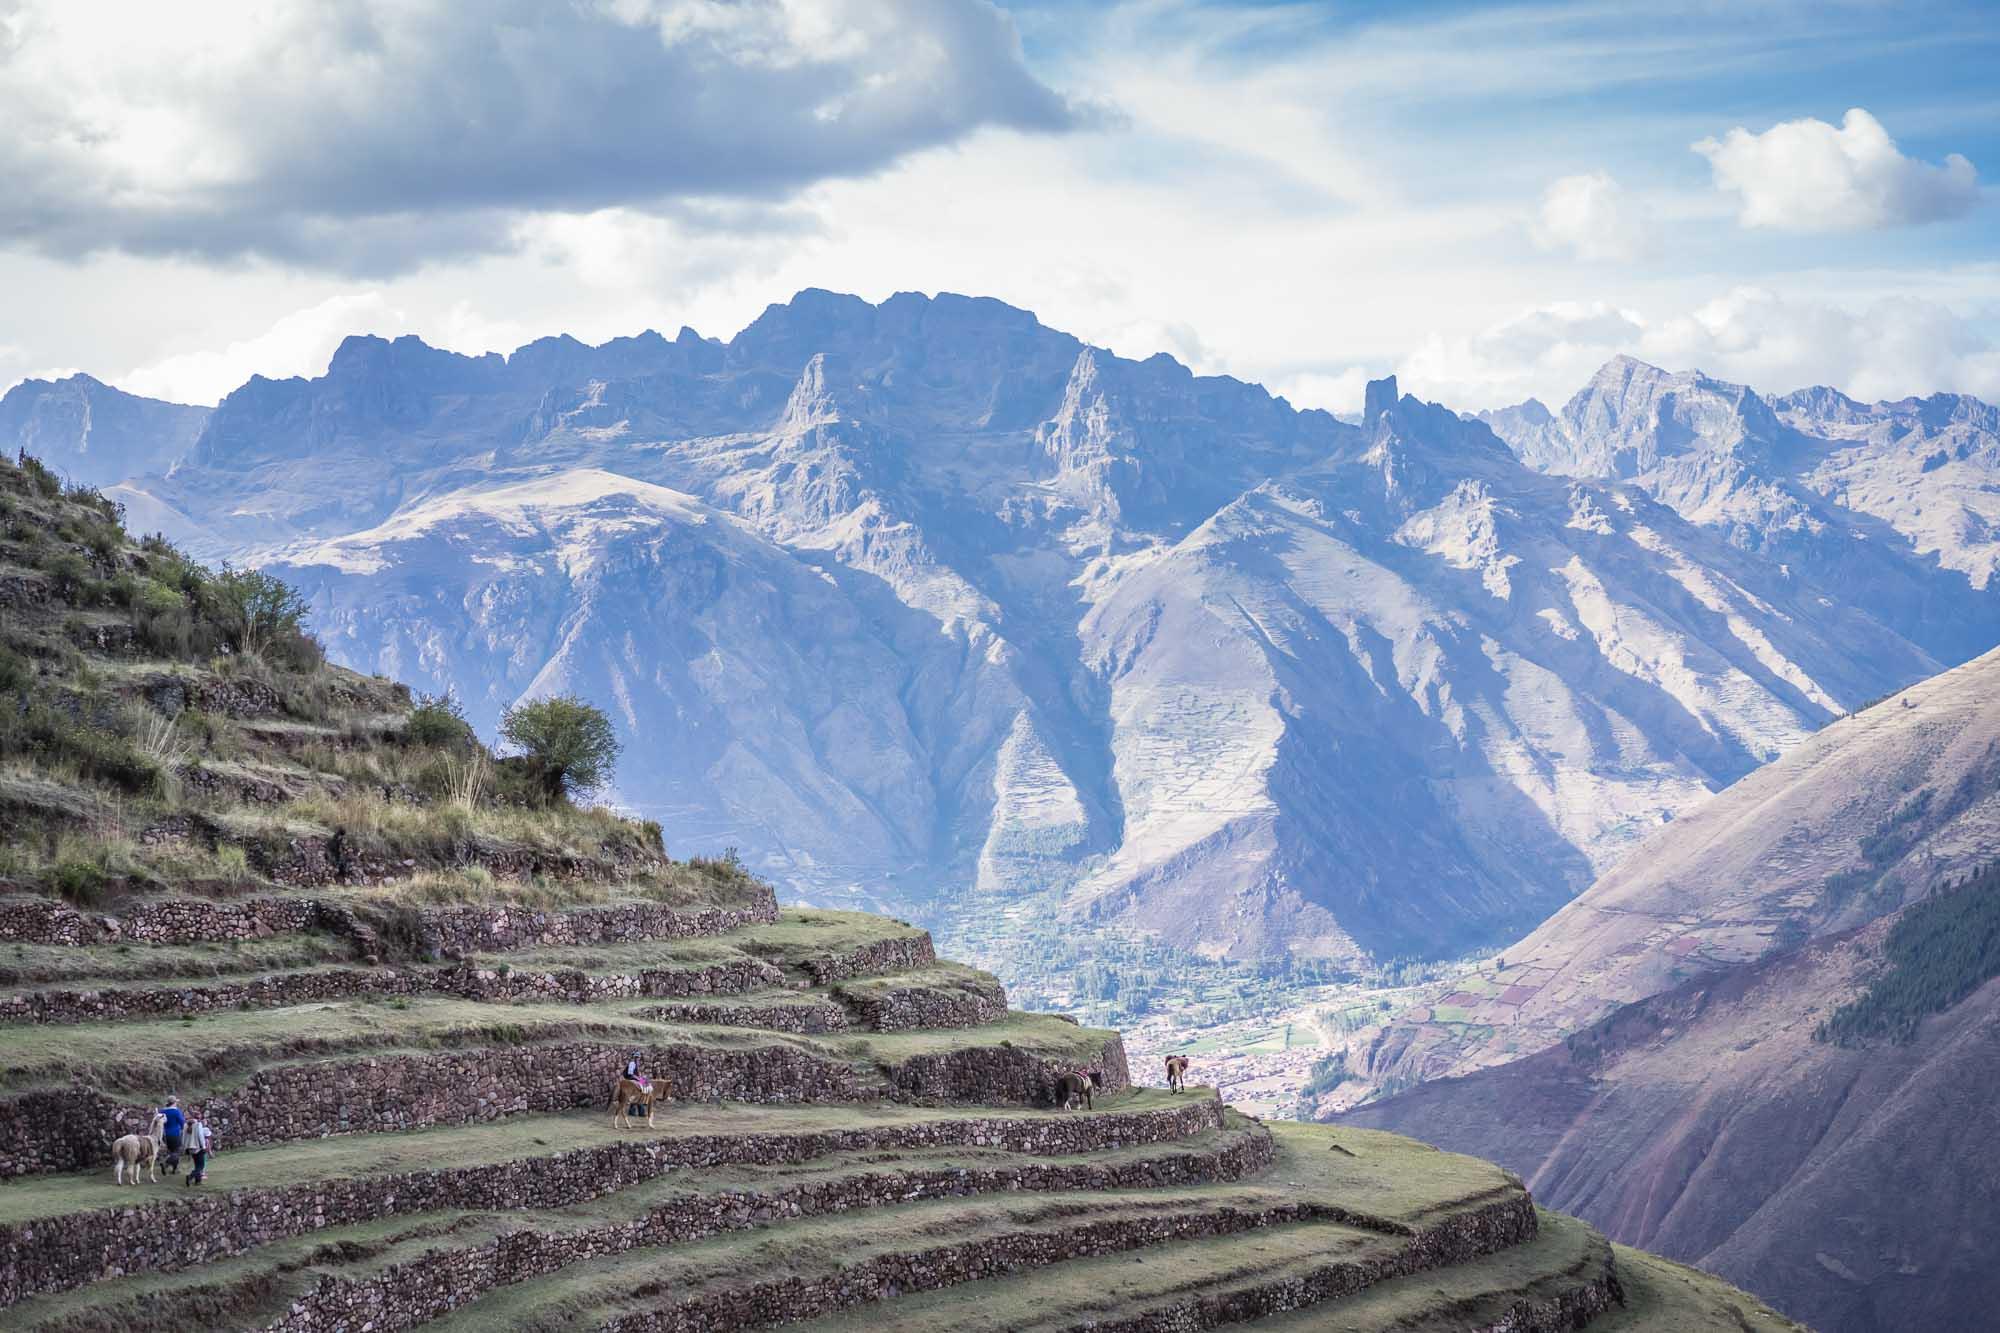 Peak Andes hiking tour: Cusco adventure holiday in Peru